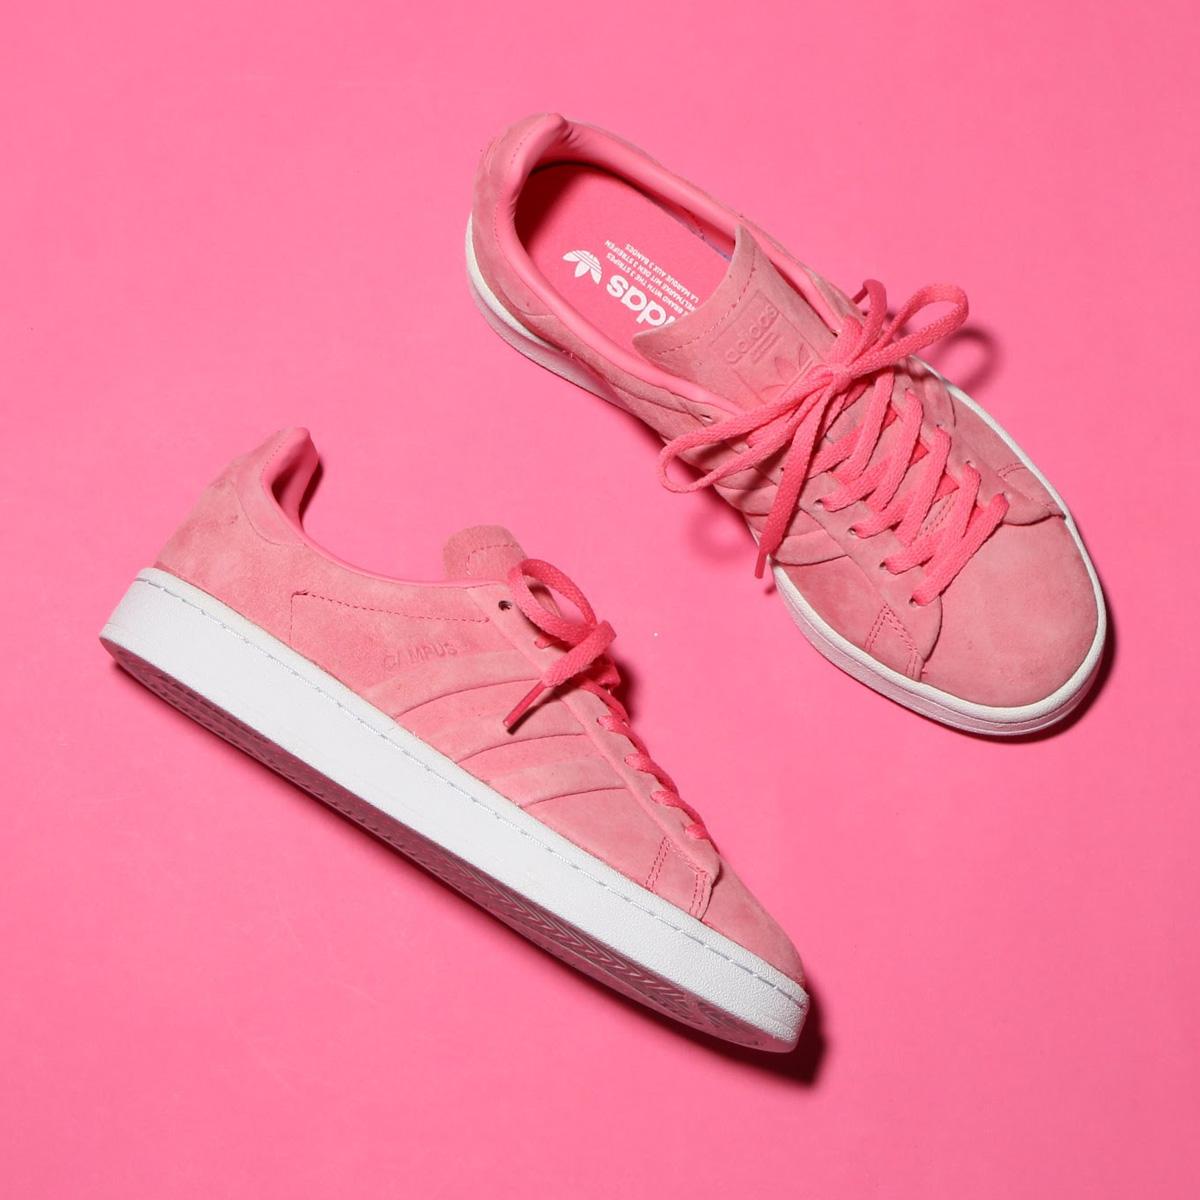 promo code 9b6a2 79314 adidas Originals CAMPUS STITCH AND TURN W (Adidas original scan pass stitch  and turn W) (chalk pink S18 chalk pink S18 goal domet) 18SS-I